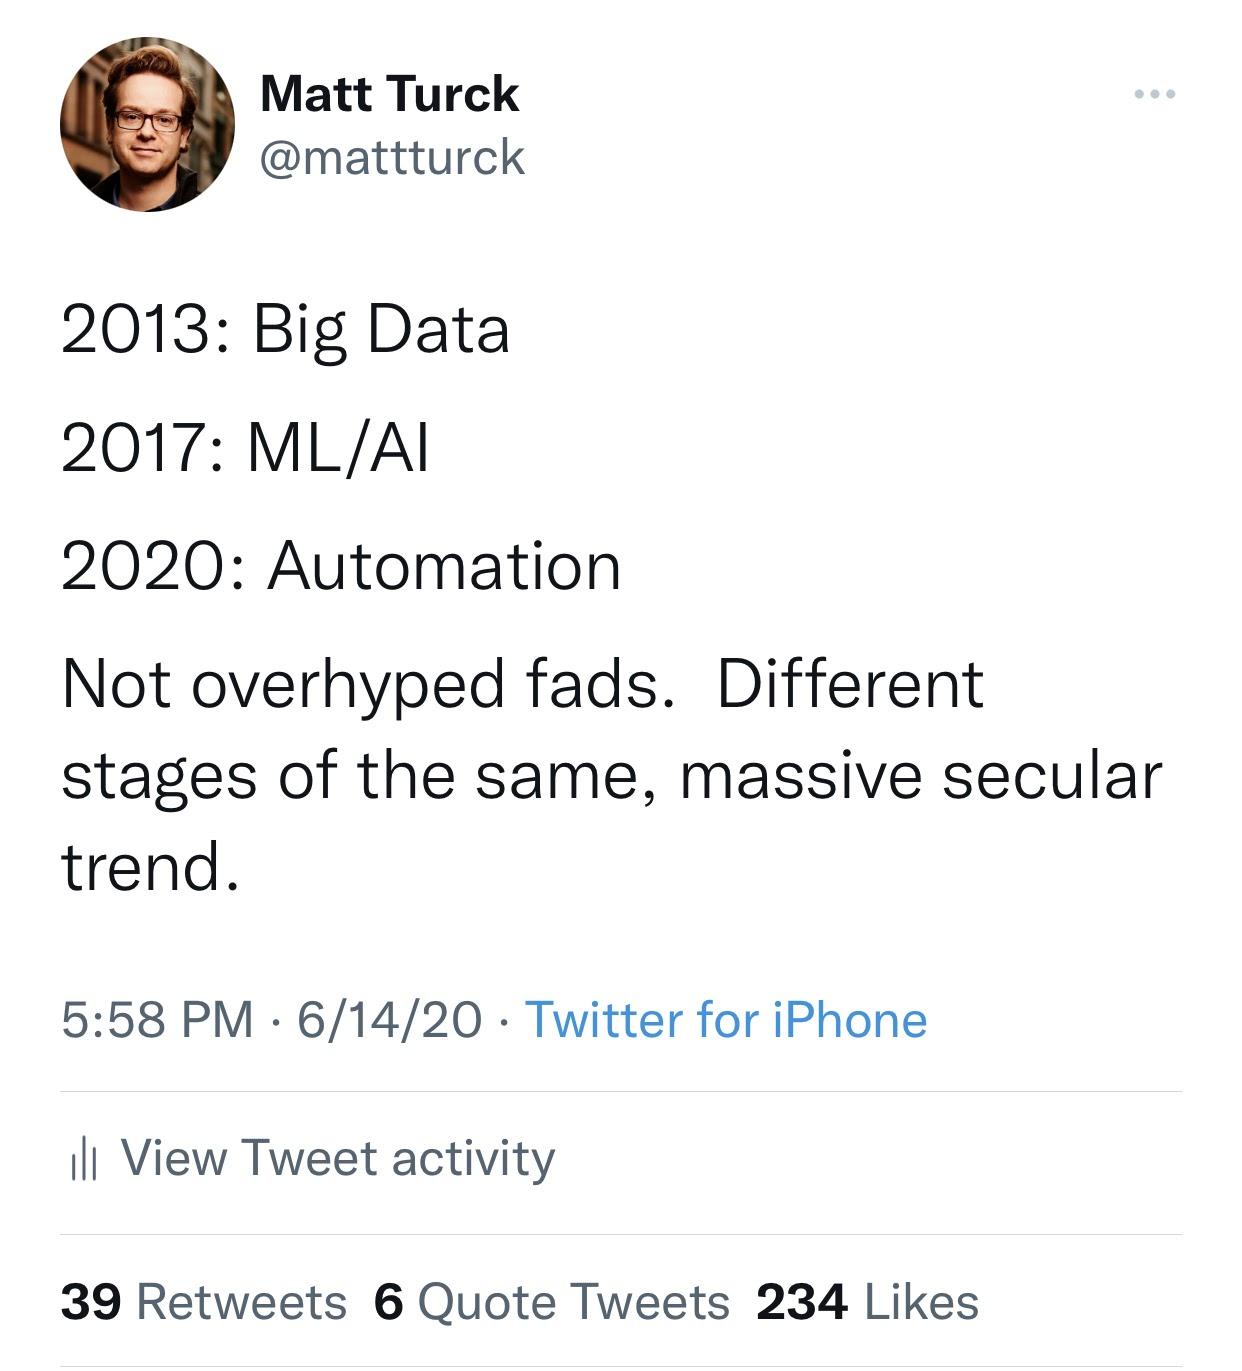 The 2021 machine learning, AI, and data landscape – VentureBeat